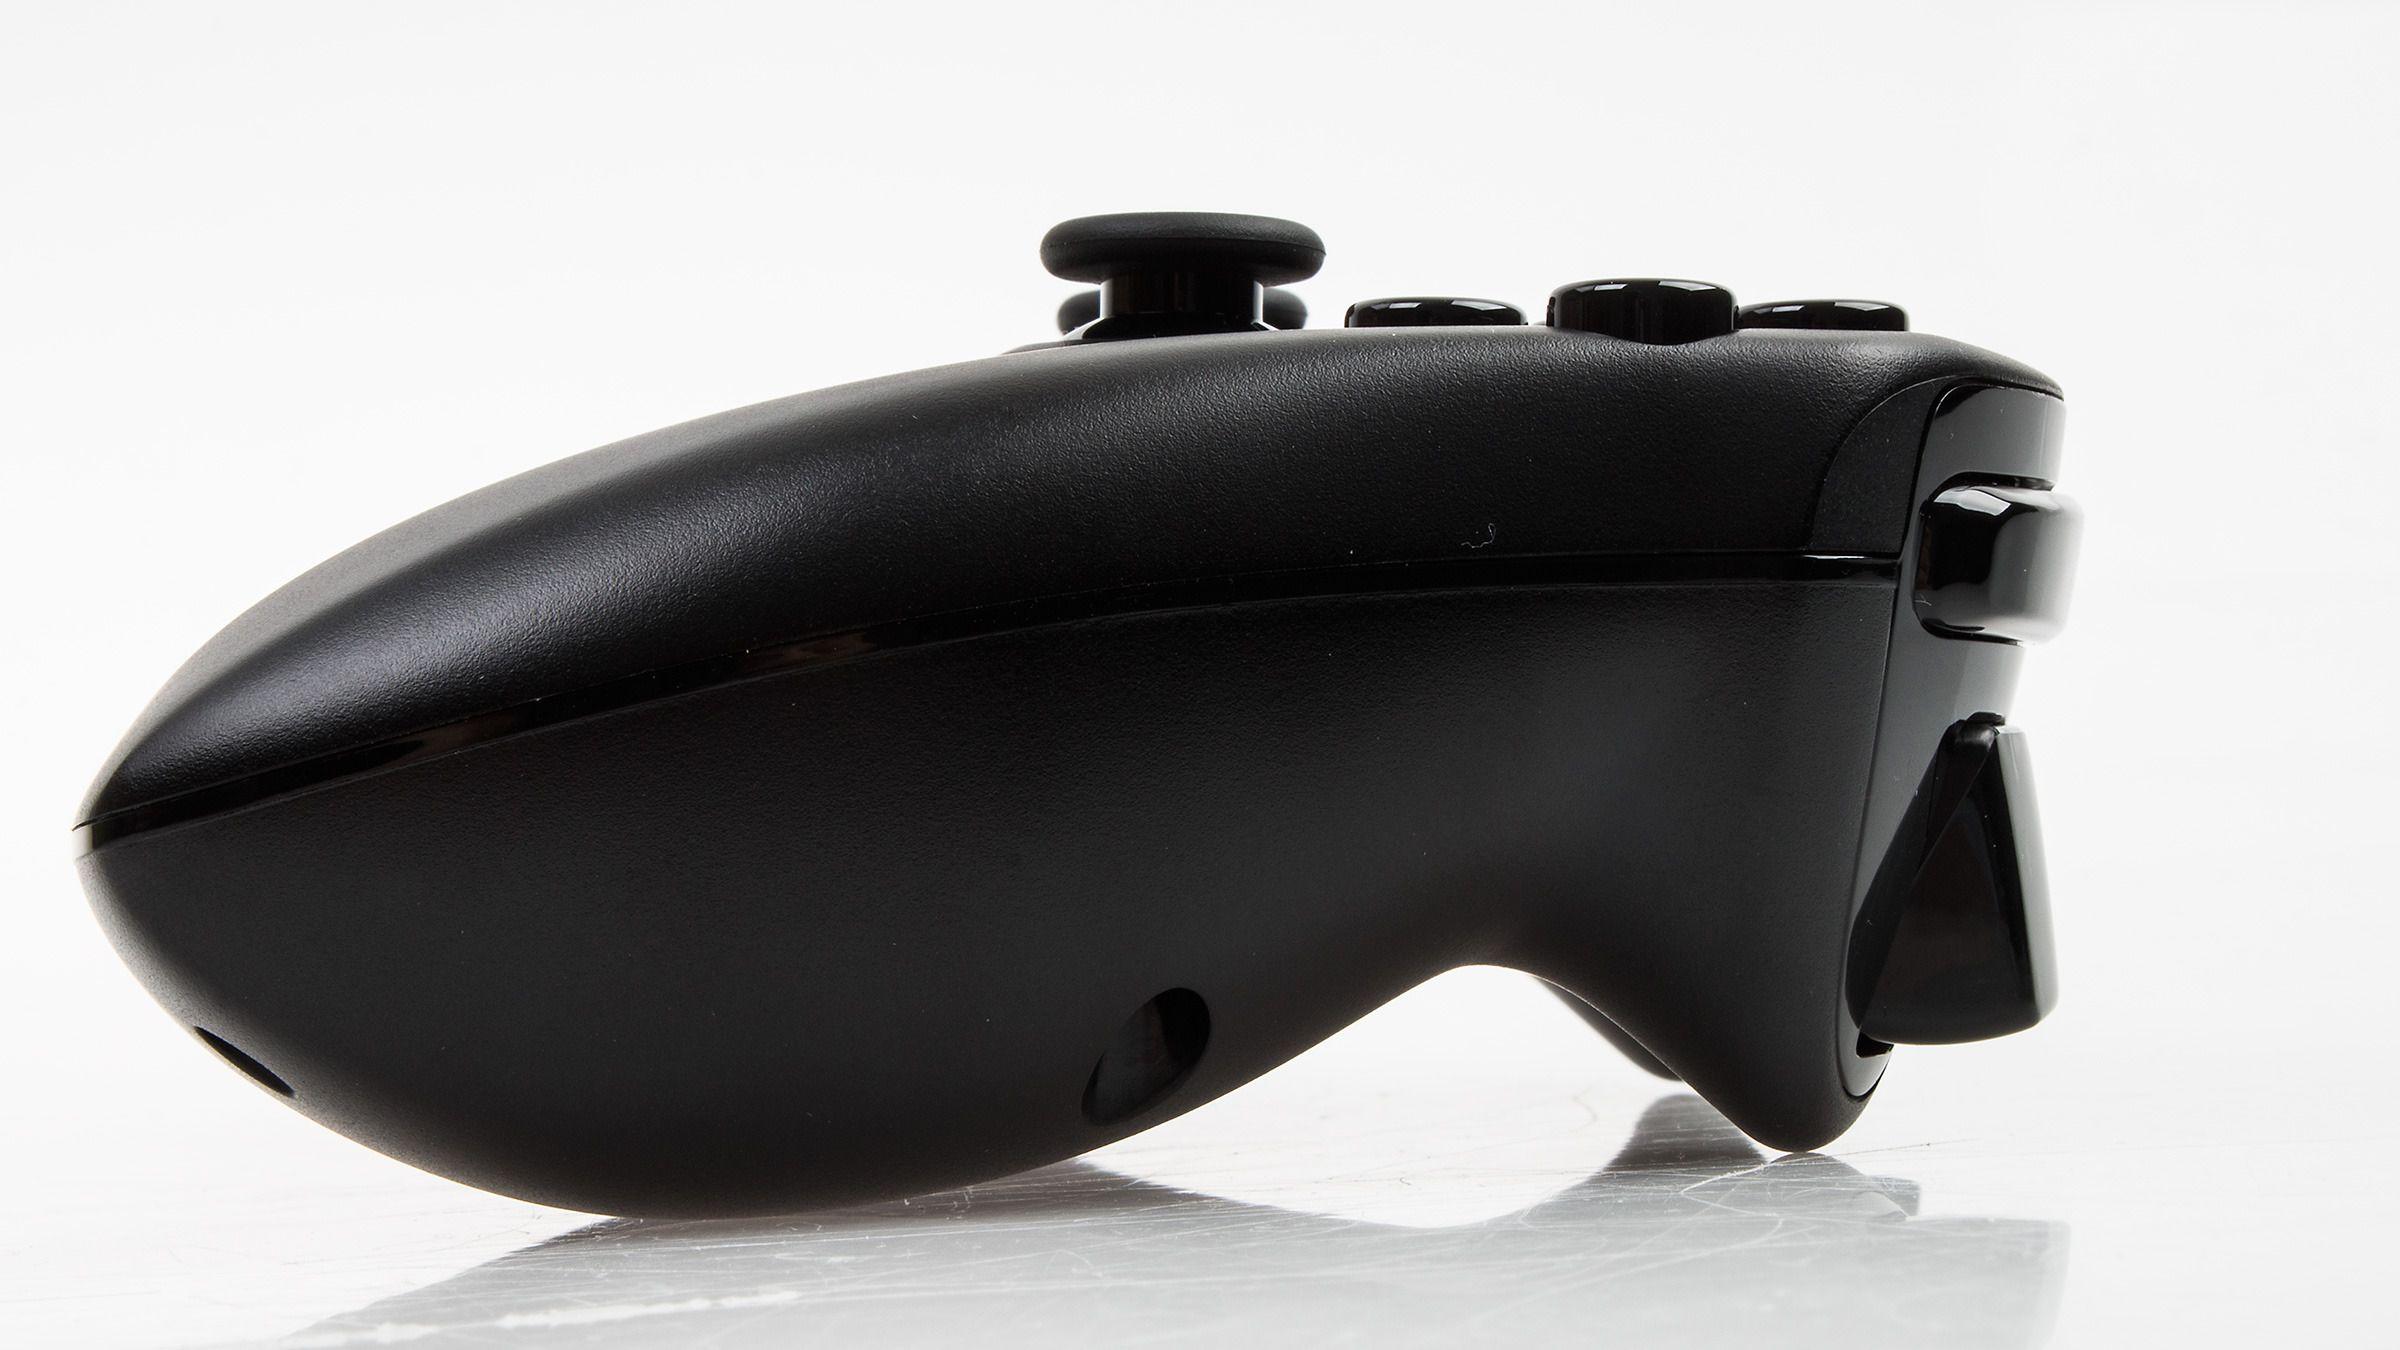 Slik ser Nvidia Shield Wireless Controller ut i profil.Foto: Varg Aamo, Hardware.no